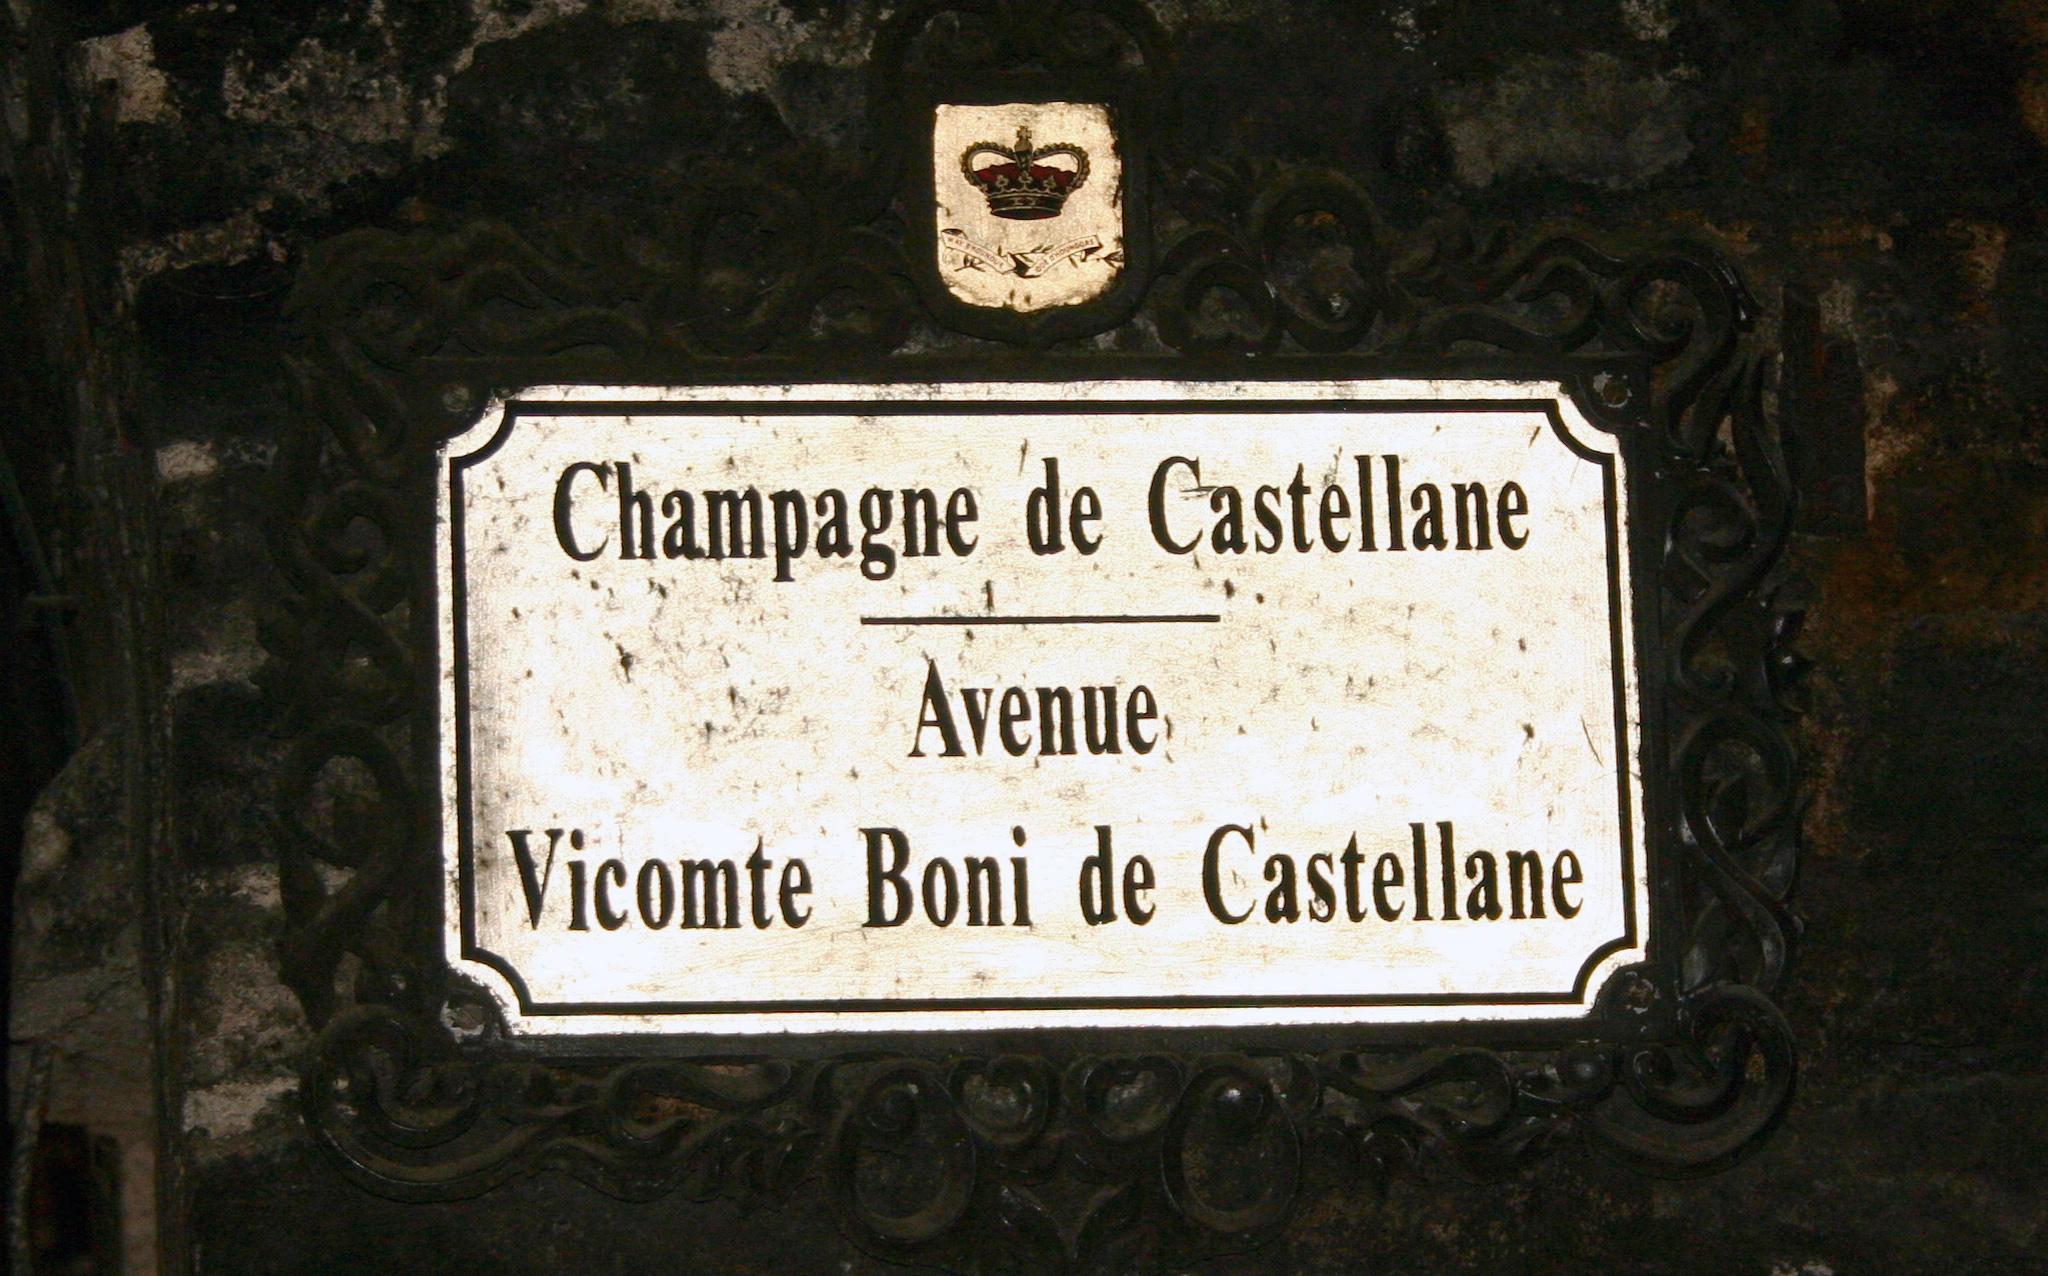 Cellar Signage: Avenue Vicomte Boni de Castellane